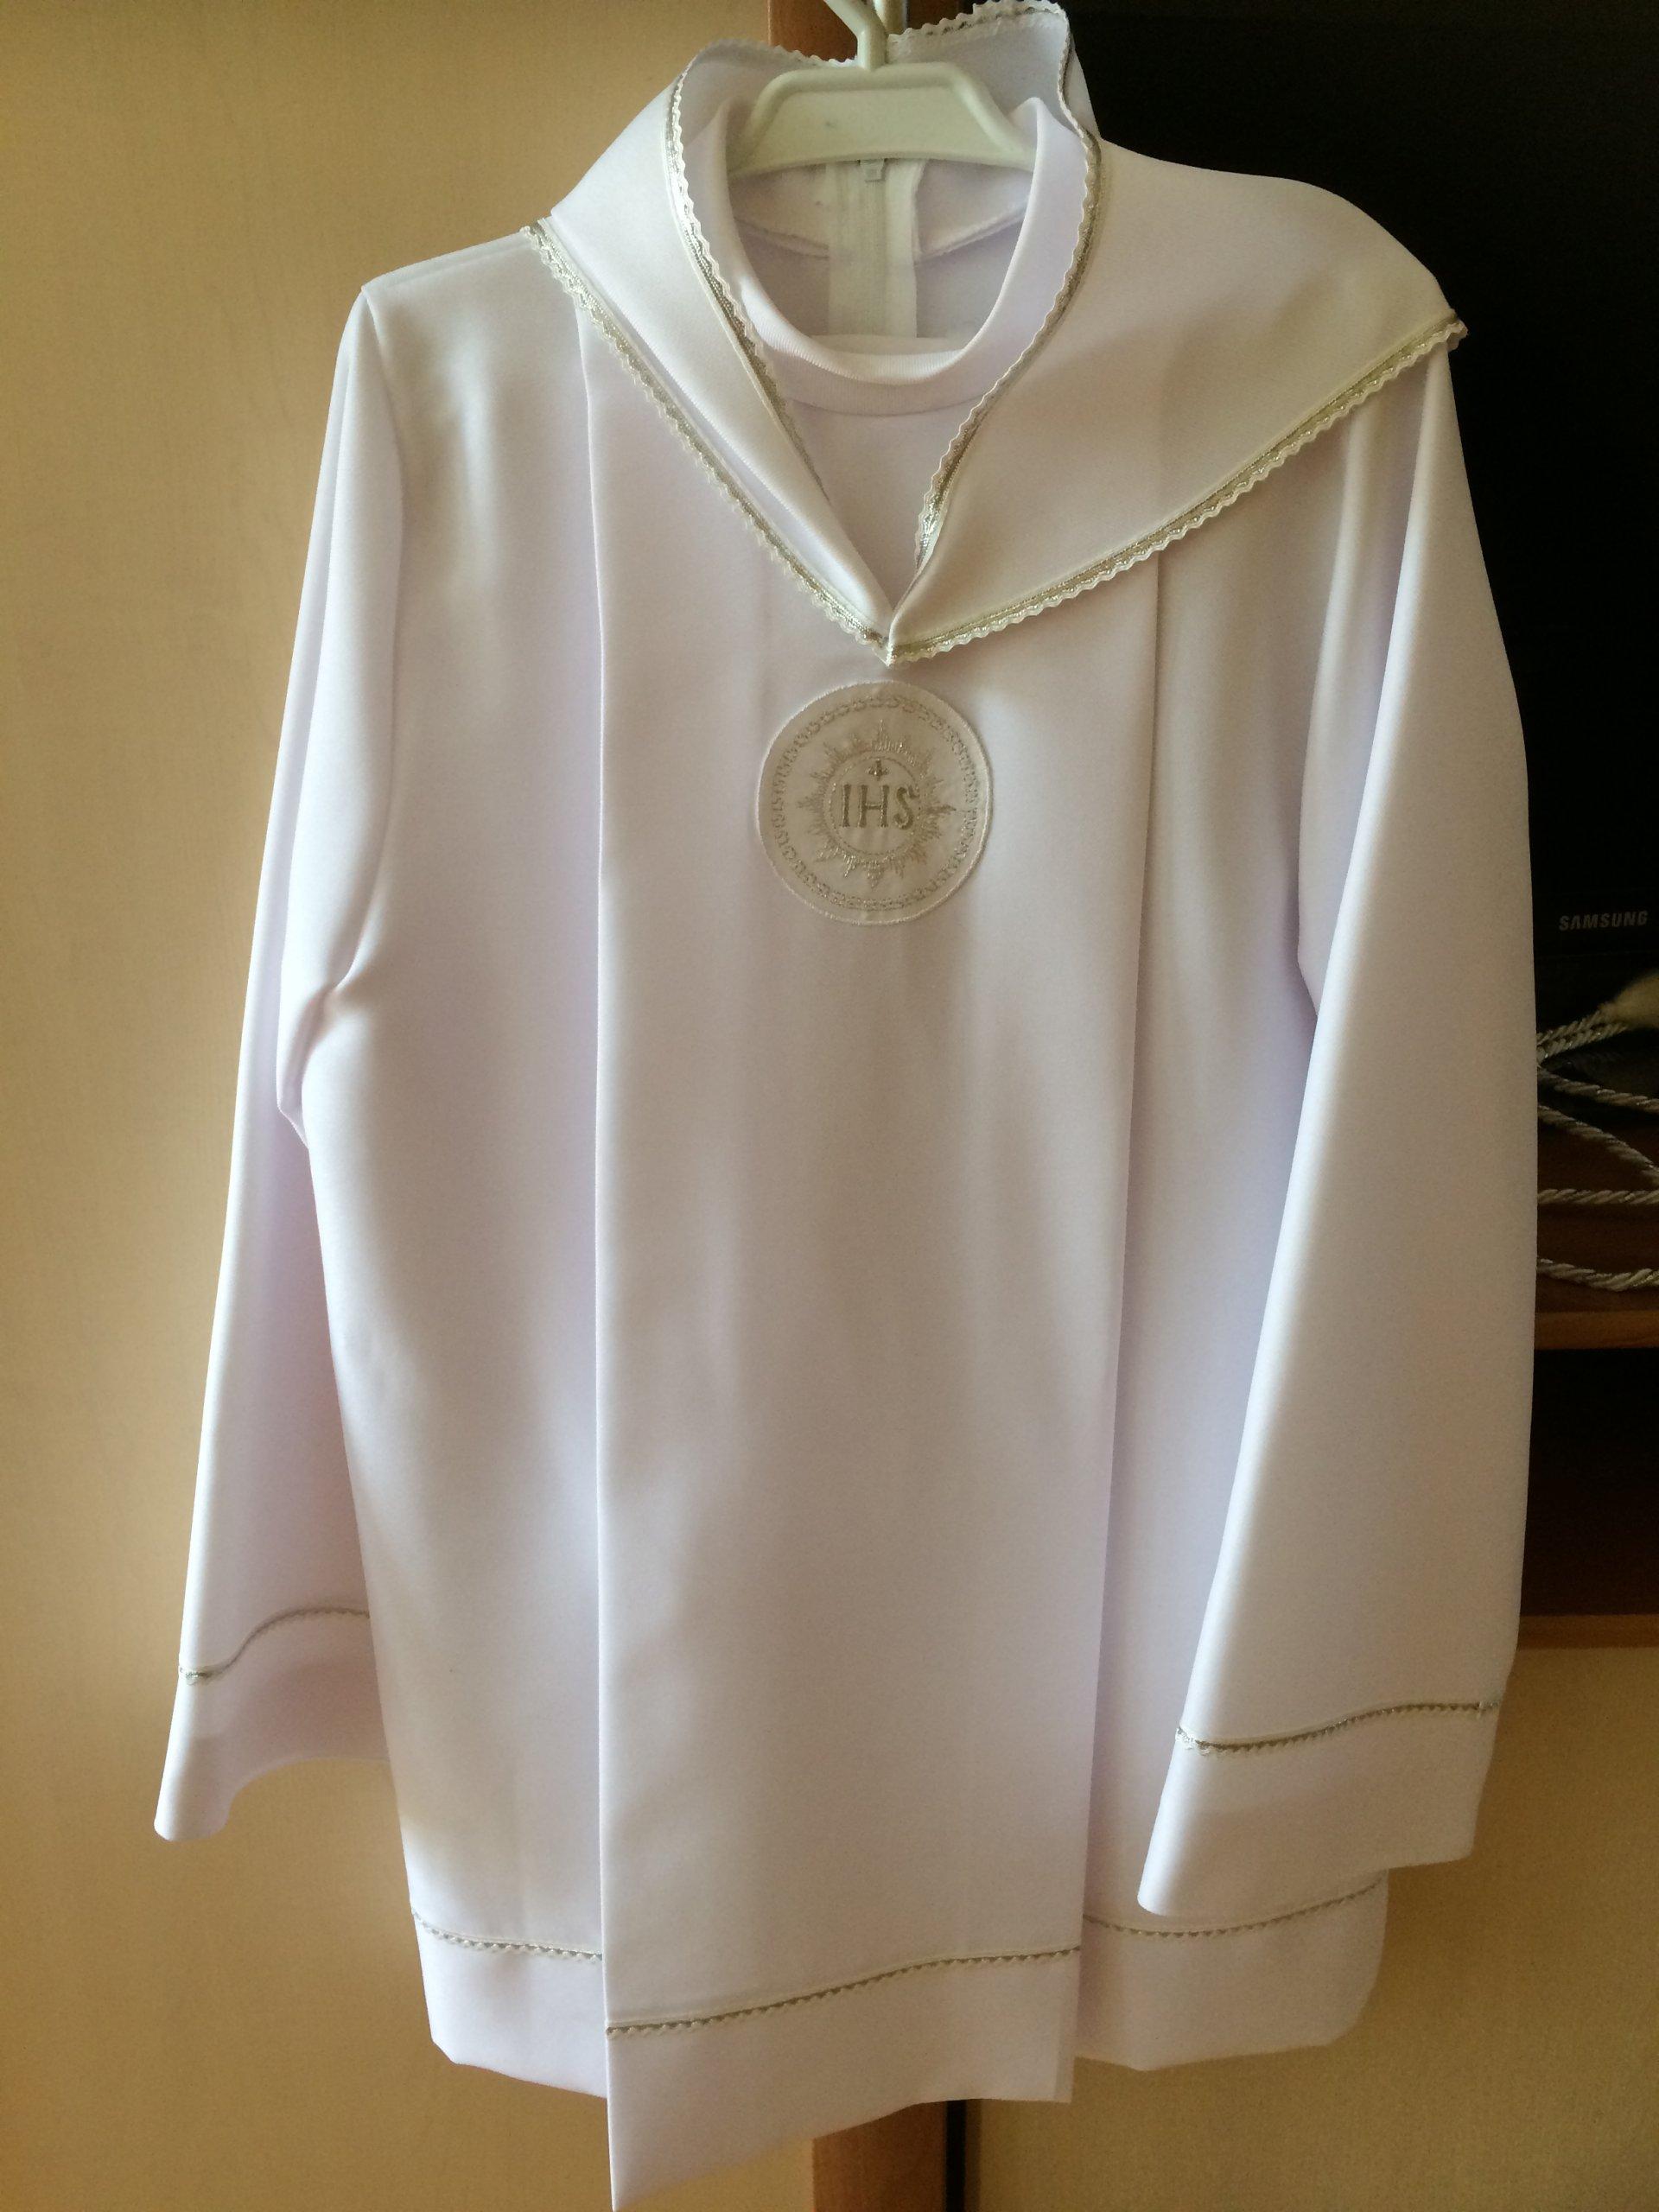 86e5fb96f9 Alba komunijna krótka ze spodniami dla chłopca - 7109445322 ...